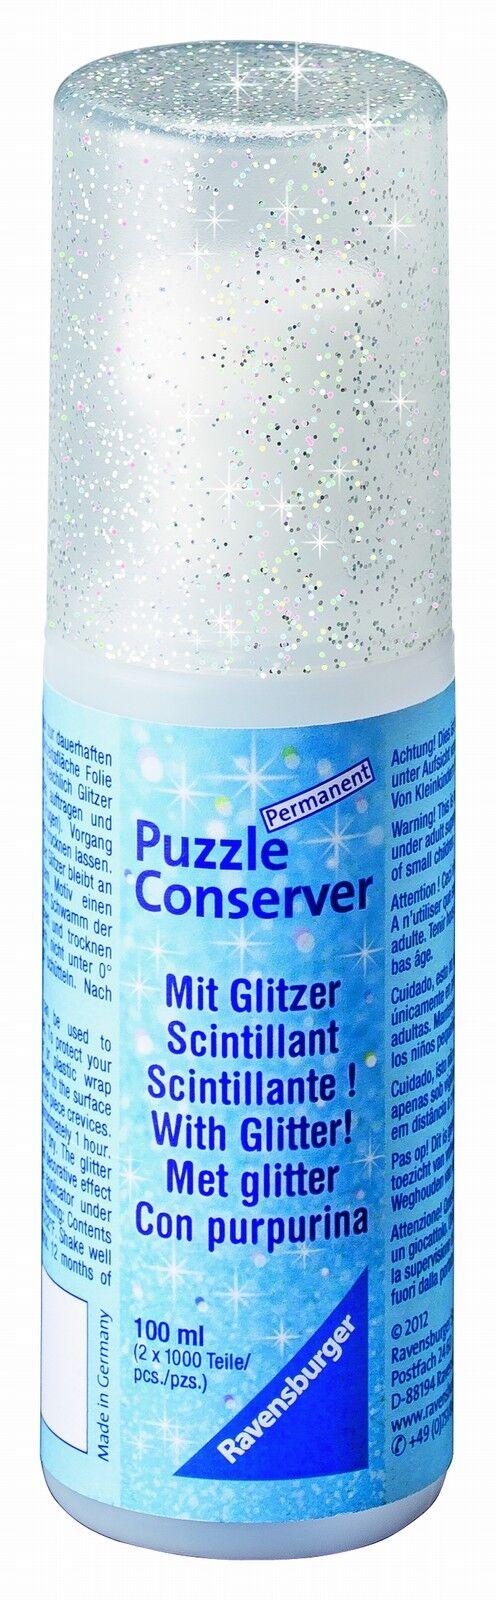 Ravensburger Ravensburger Ravensburger Puzzle Puzzlekonservierer Puzzlekleber Conserver Glitter Adhesive e9ce18